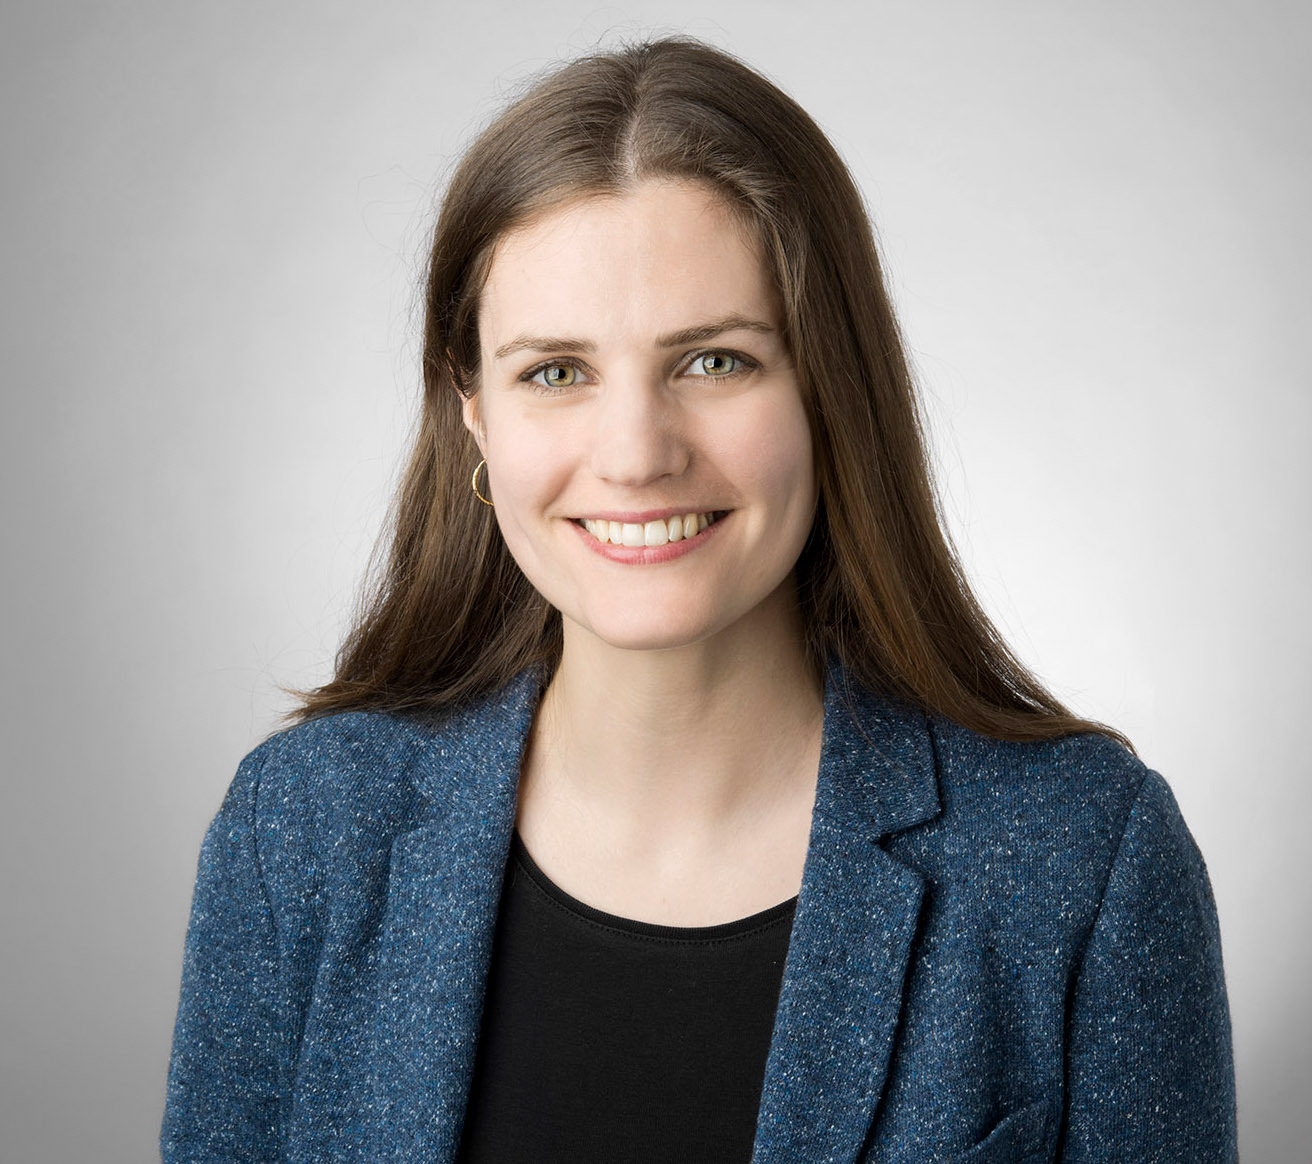 Dr. Eva-Maria Sadowski